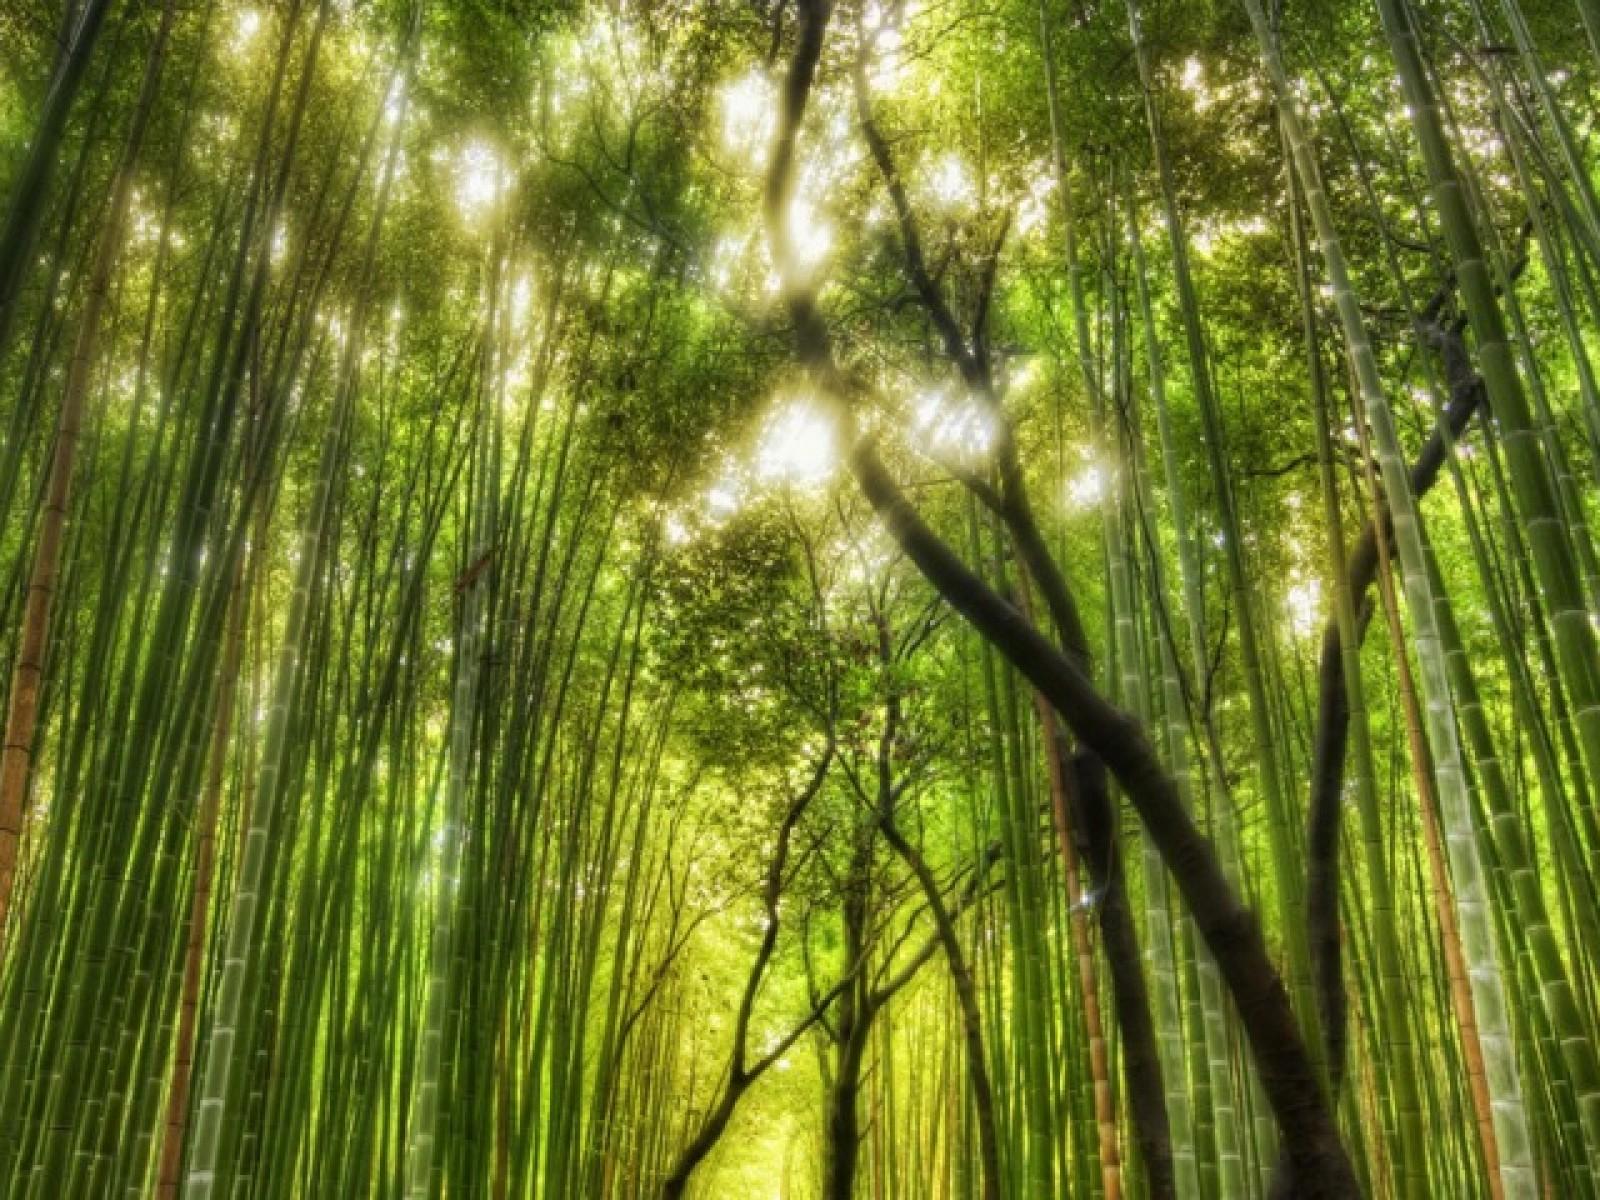 http://3.bp.blogspot.com/-0CliwLZasEA/TqwPaK543KI/AAAAAAAABbM/0flwZFQbYBc/s1600/bamboo-forest.jpg